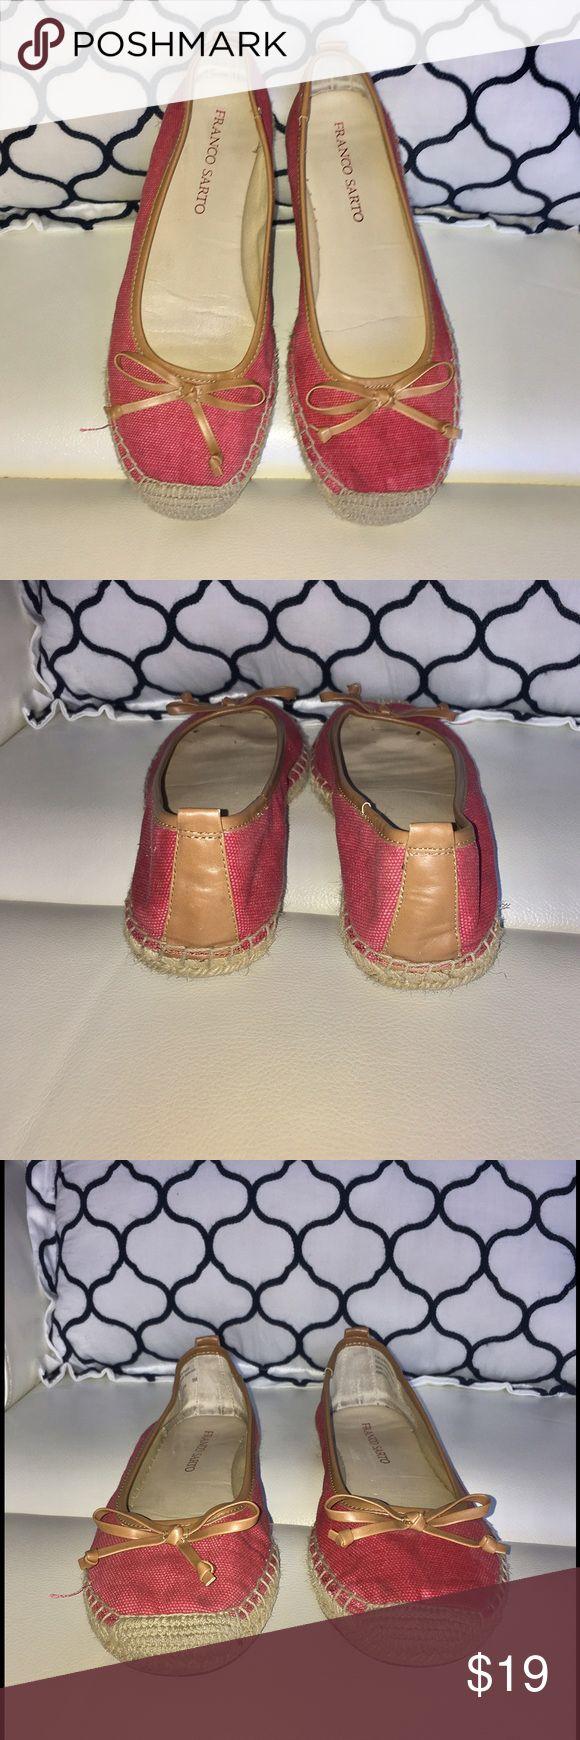 💕Franco Sarto  Espadrilles Canvas Slip On Shoes💕 Franco  Green Espadrilles Canvas Slip On Shoes used good condition  comfortable Franco Sarto Shoes Espadrilles